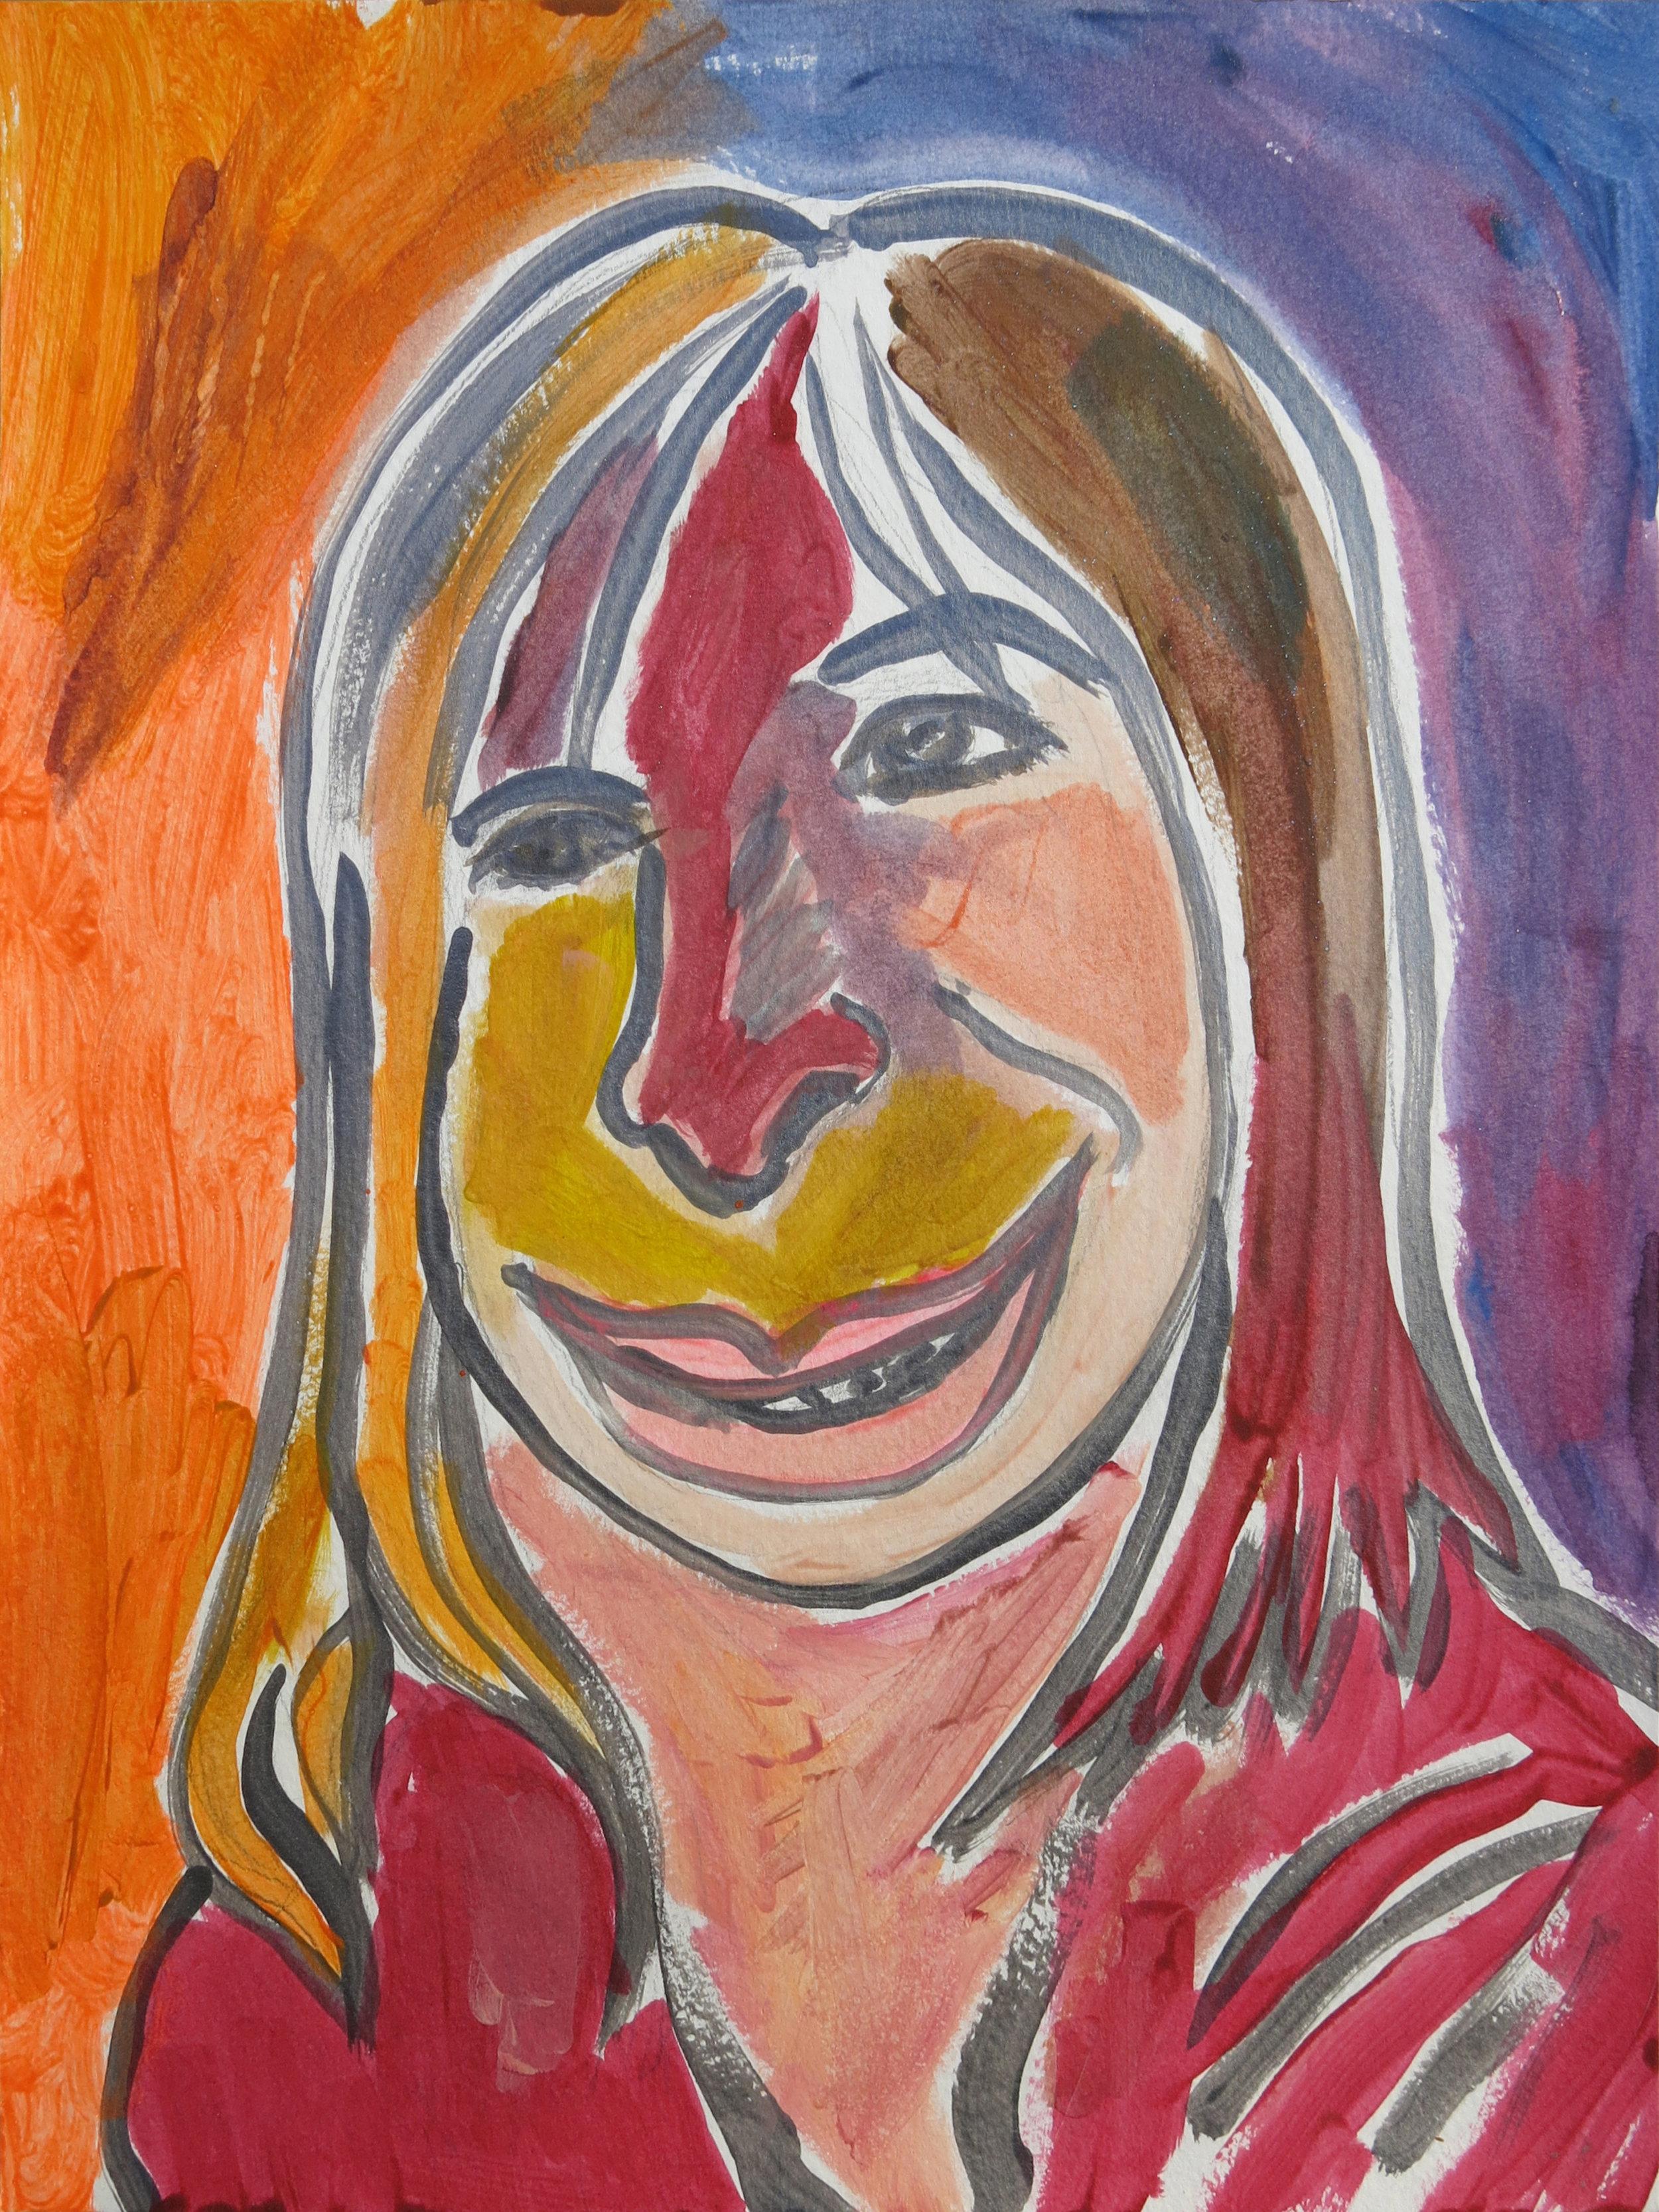 Barbra Streisand Portrait #31